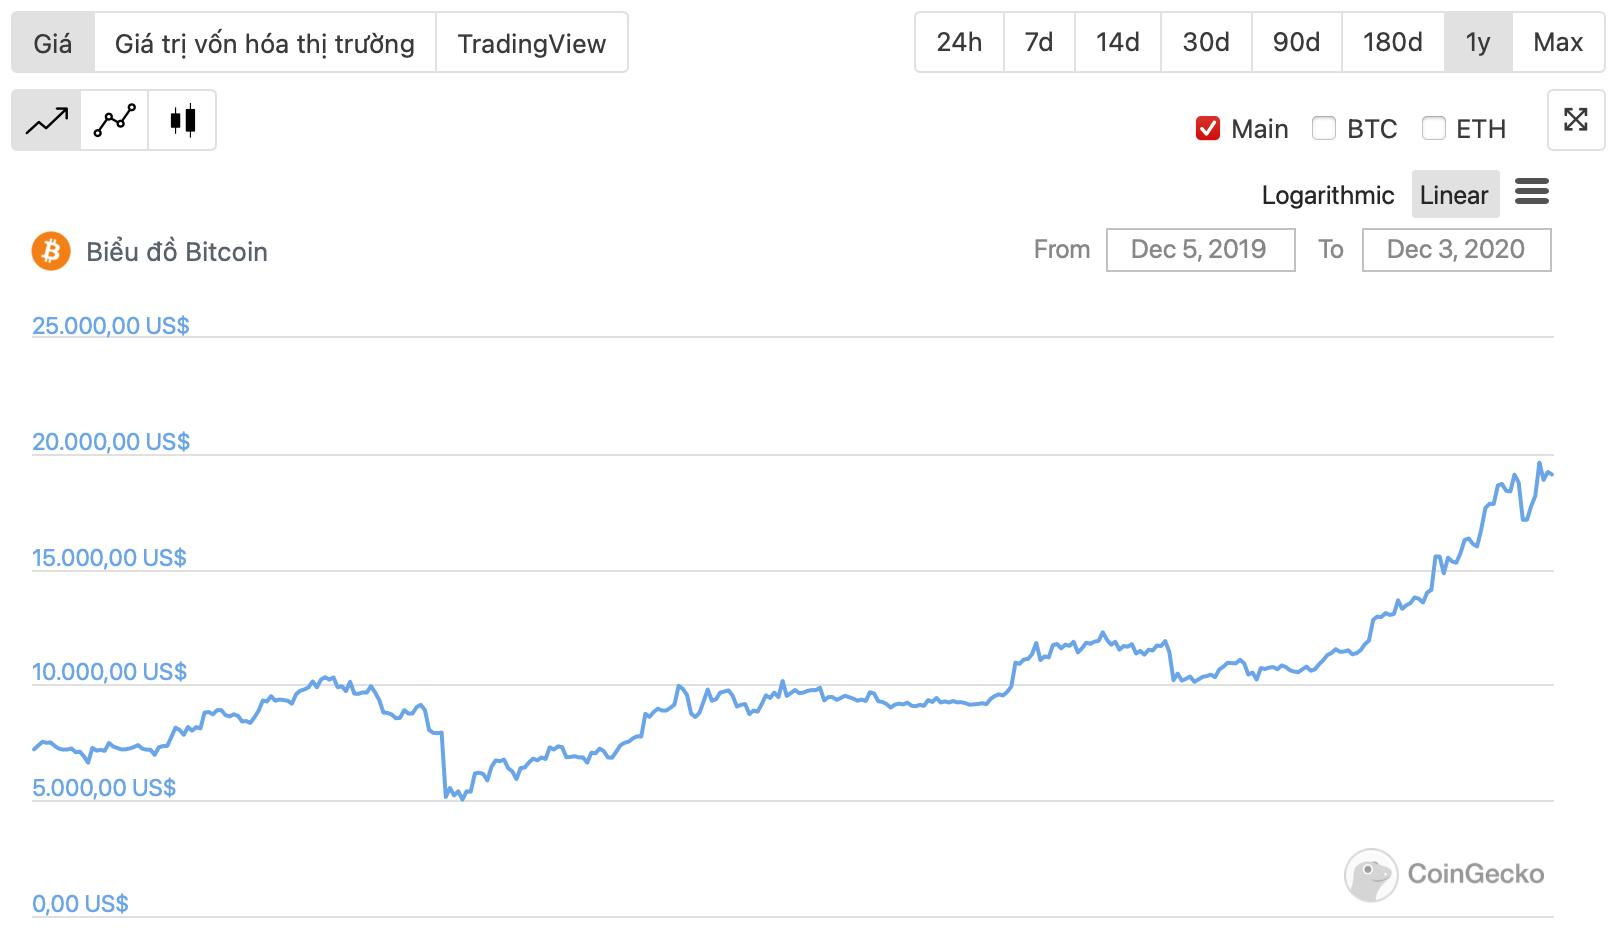 diễn biến giá btc 1 năm qua